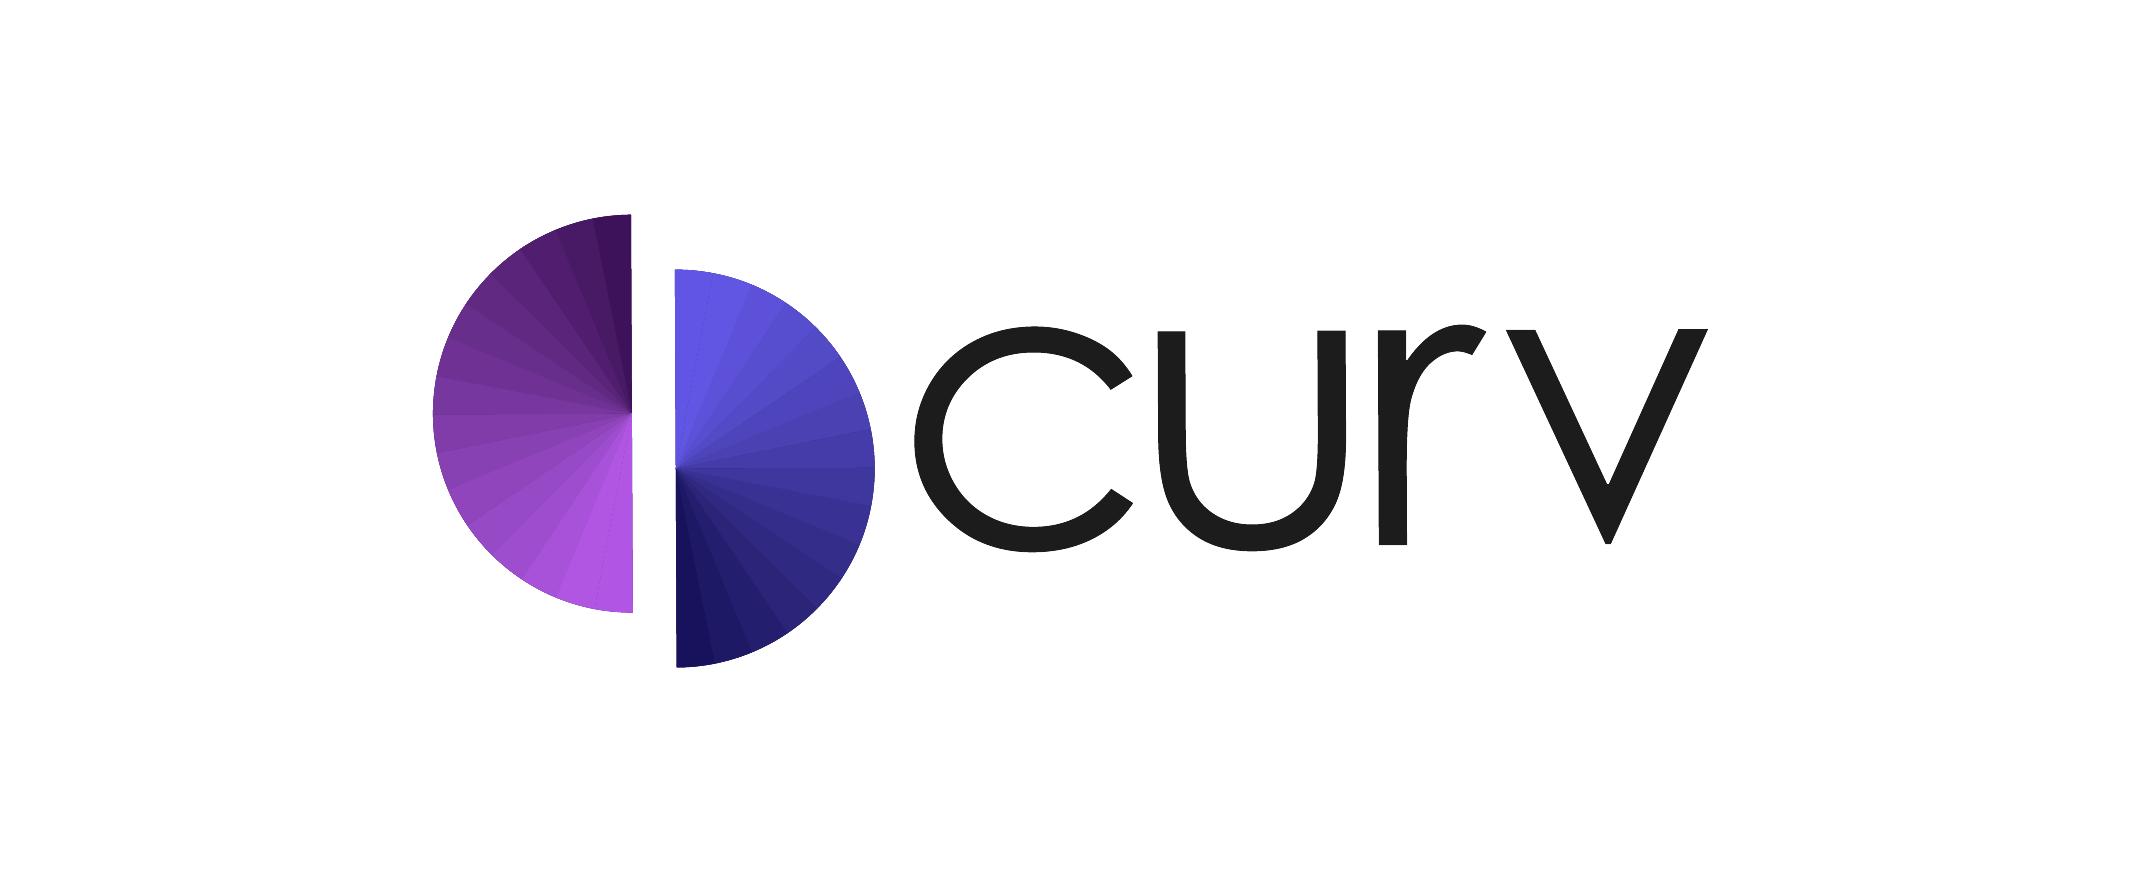 Curv Signs New Partnership With Solarisbank Subsidiary Solaris Digital Assets